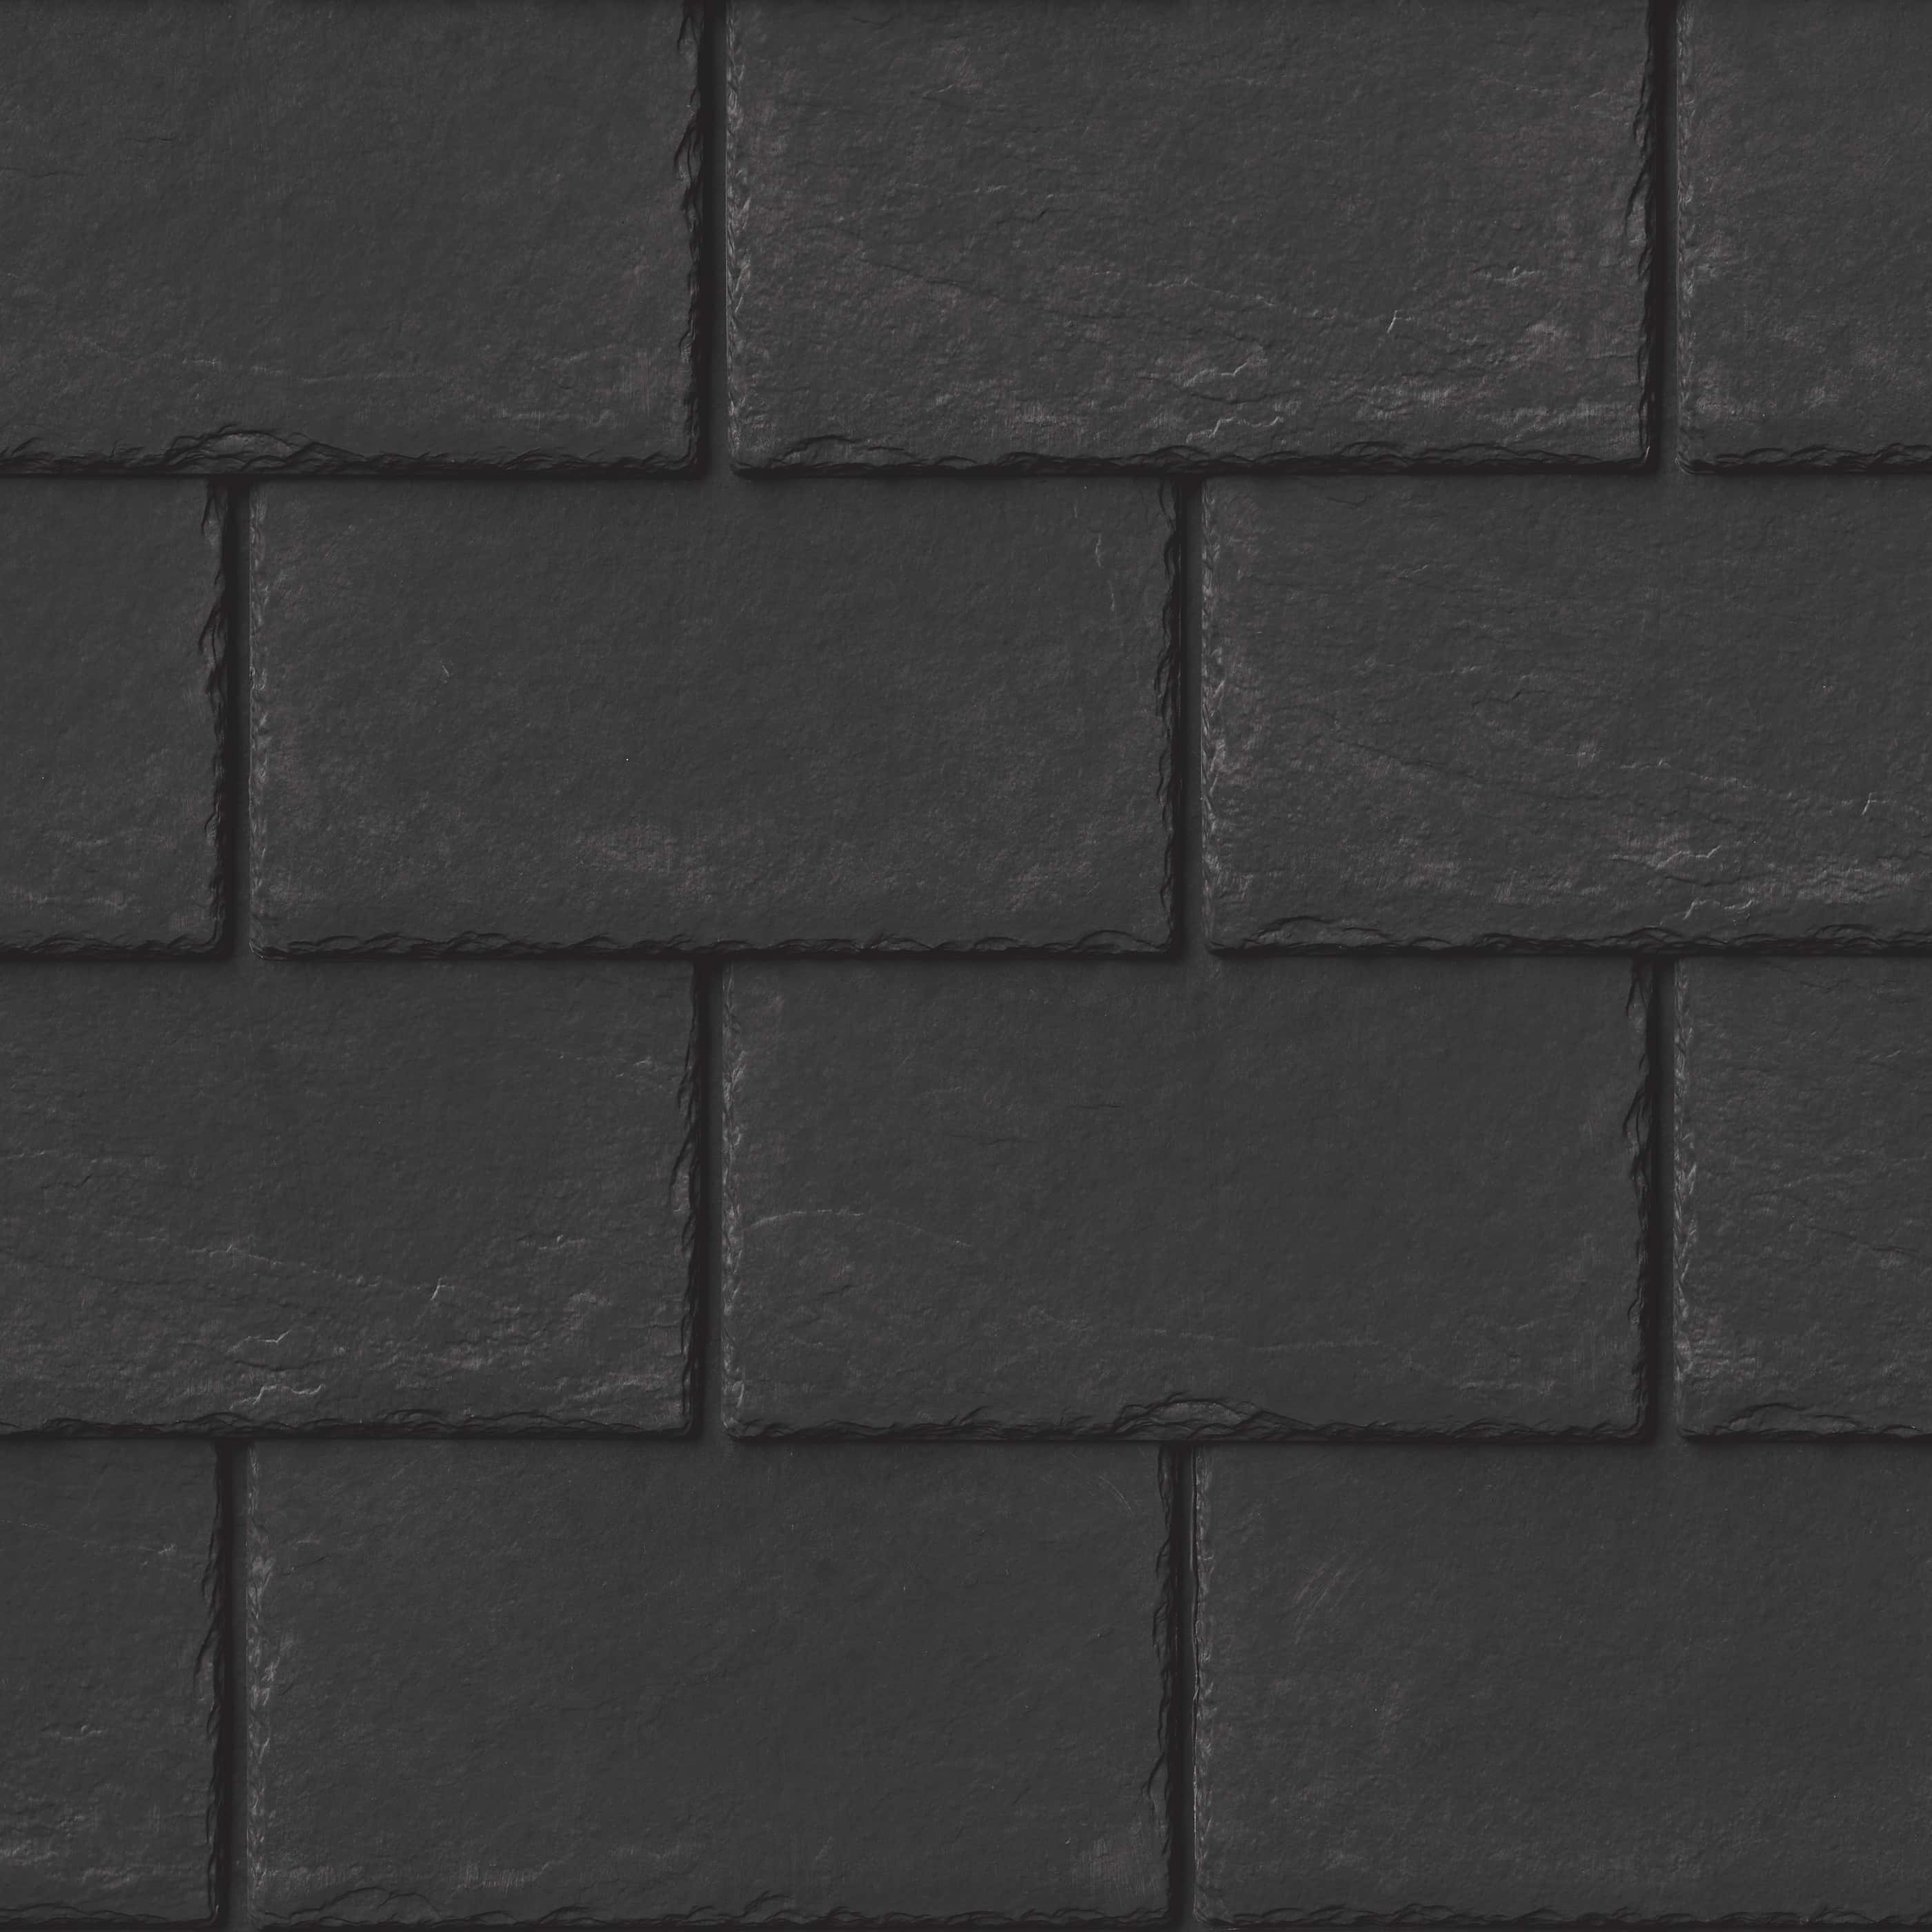 BORAL Classic Slate Charcoal Black Swatch